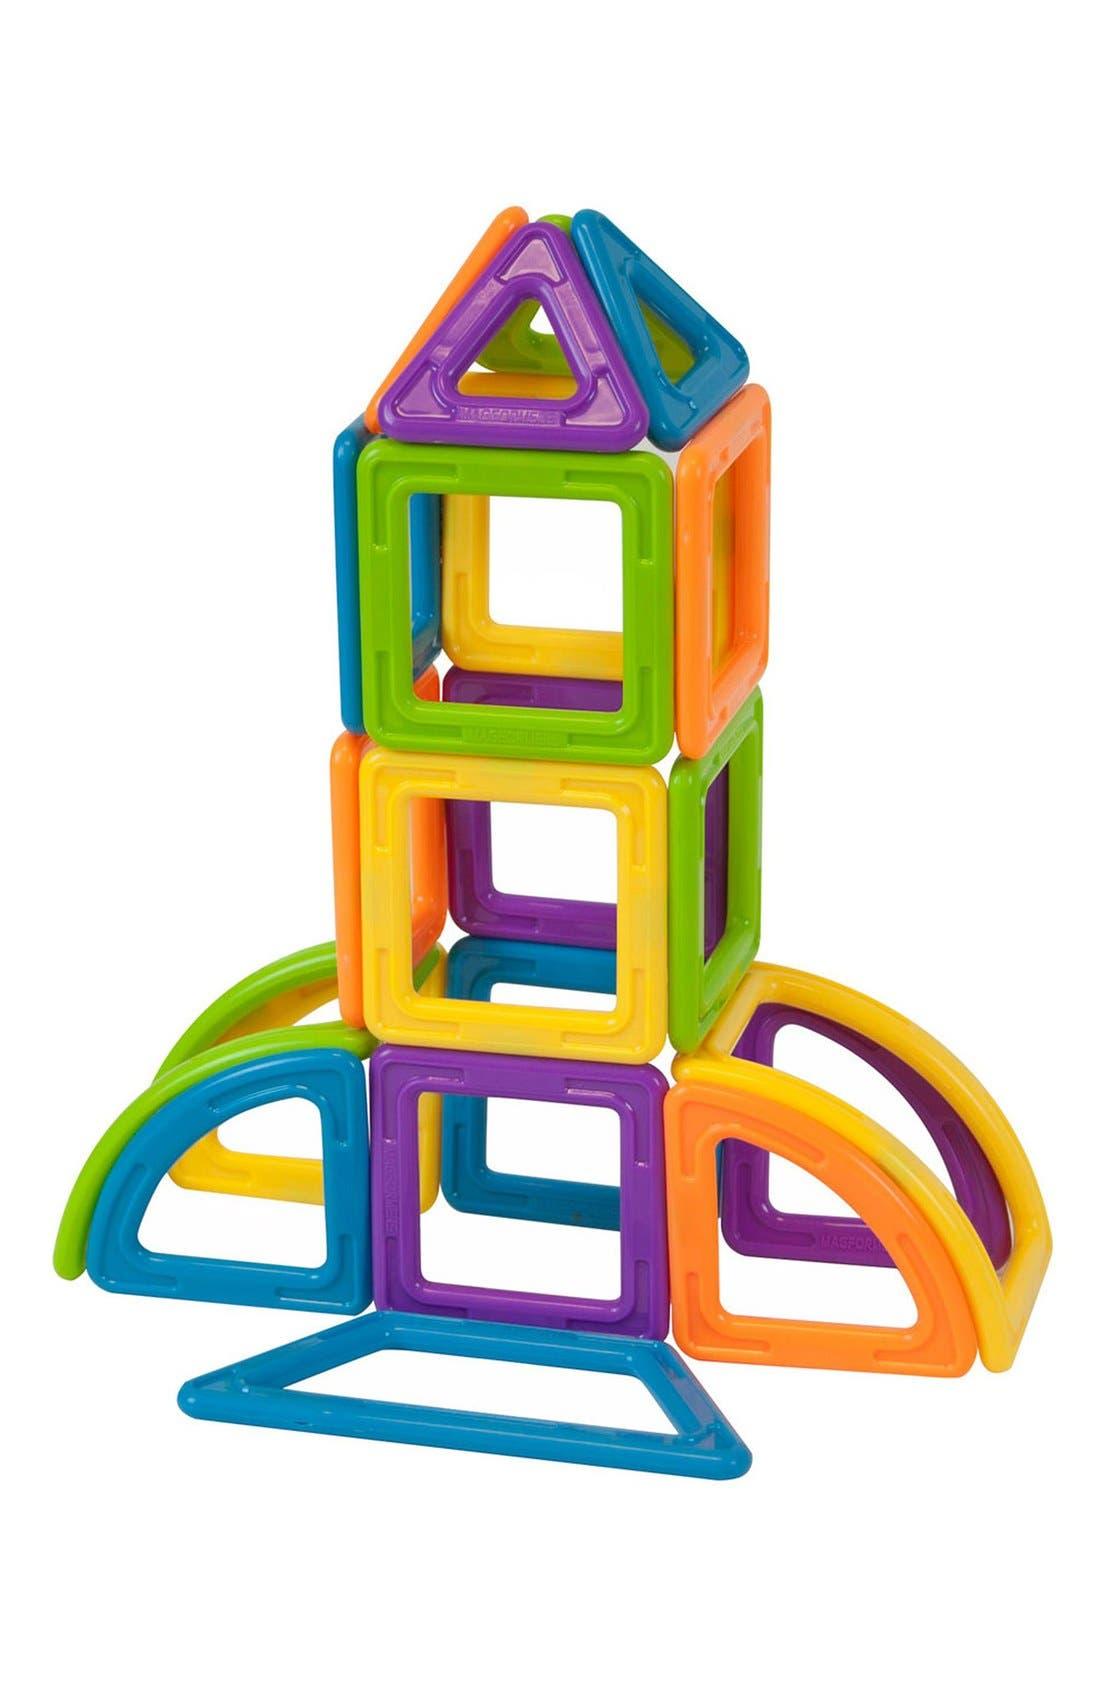 'Vehicle - WOW' Magnetic 3D Construction Set,                             Alternate thumbnail 6, color,                             Opaque Rainbow